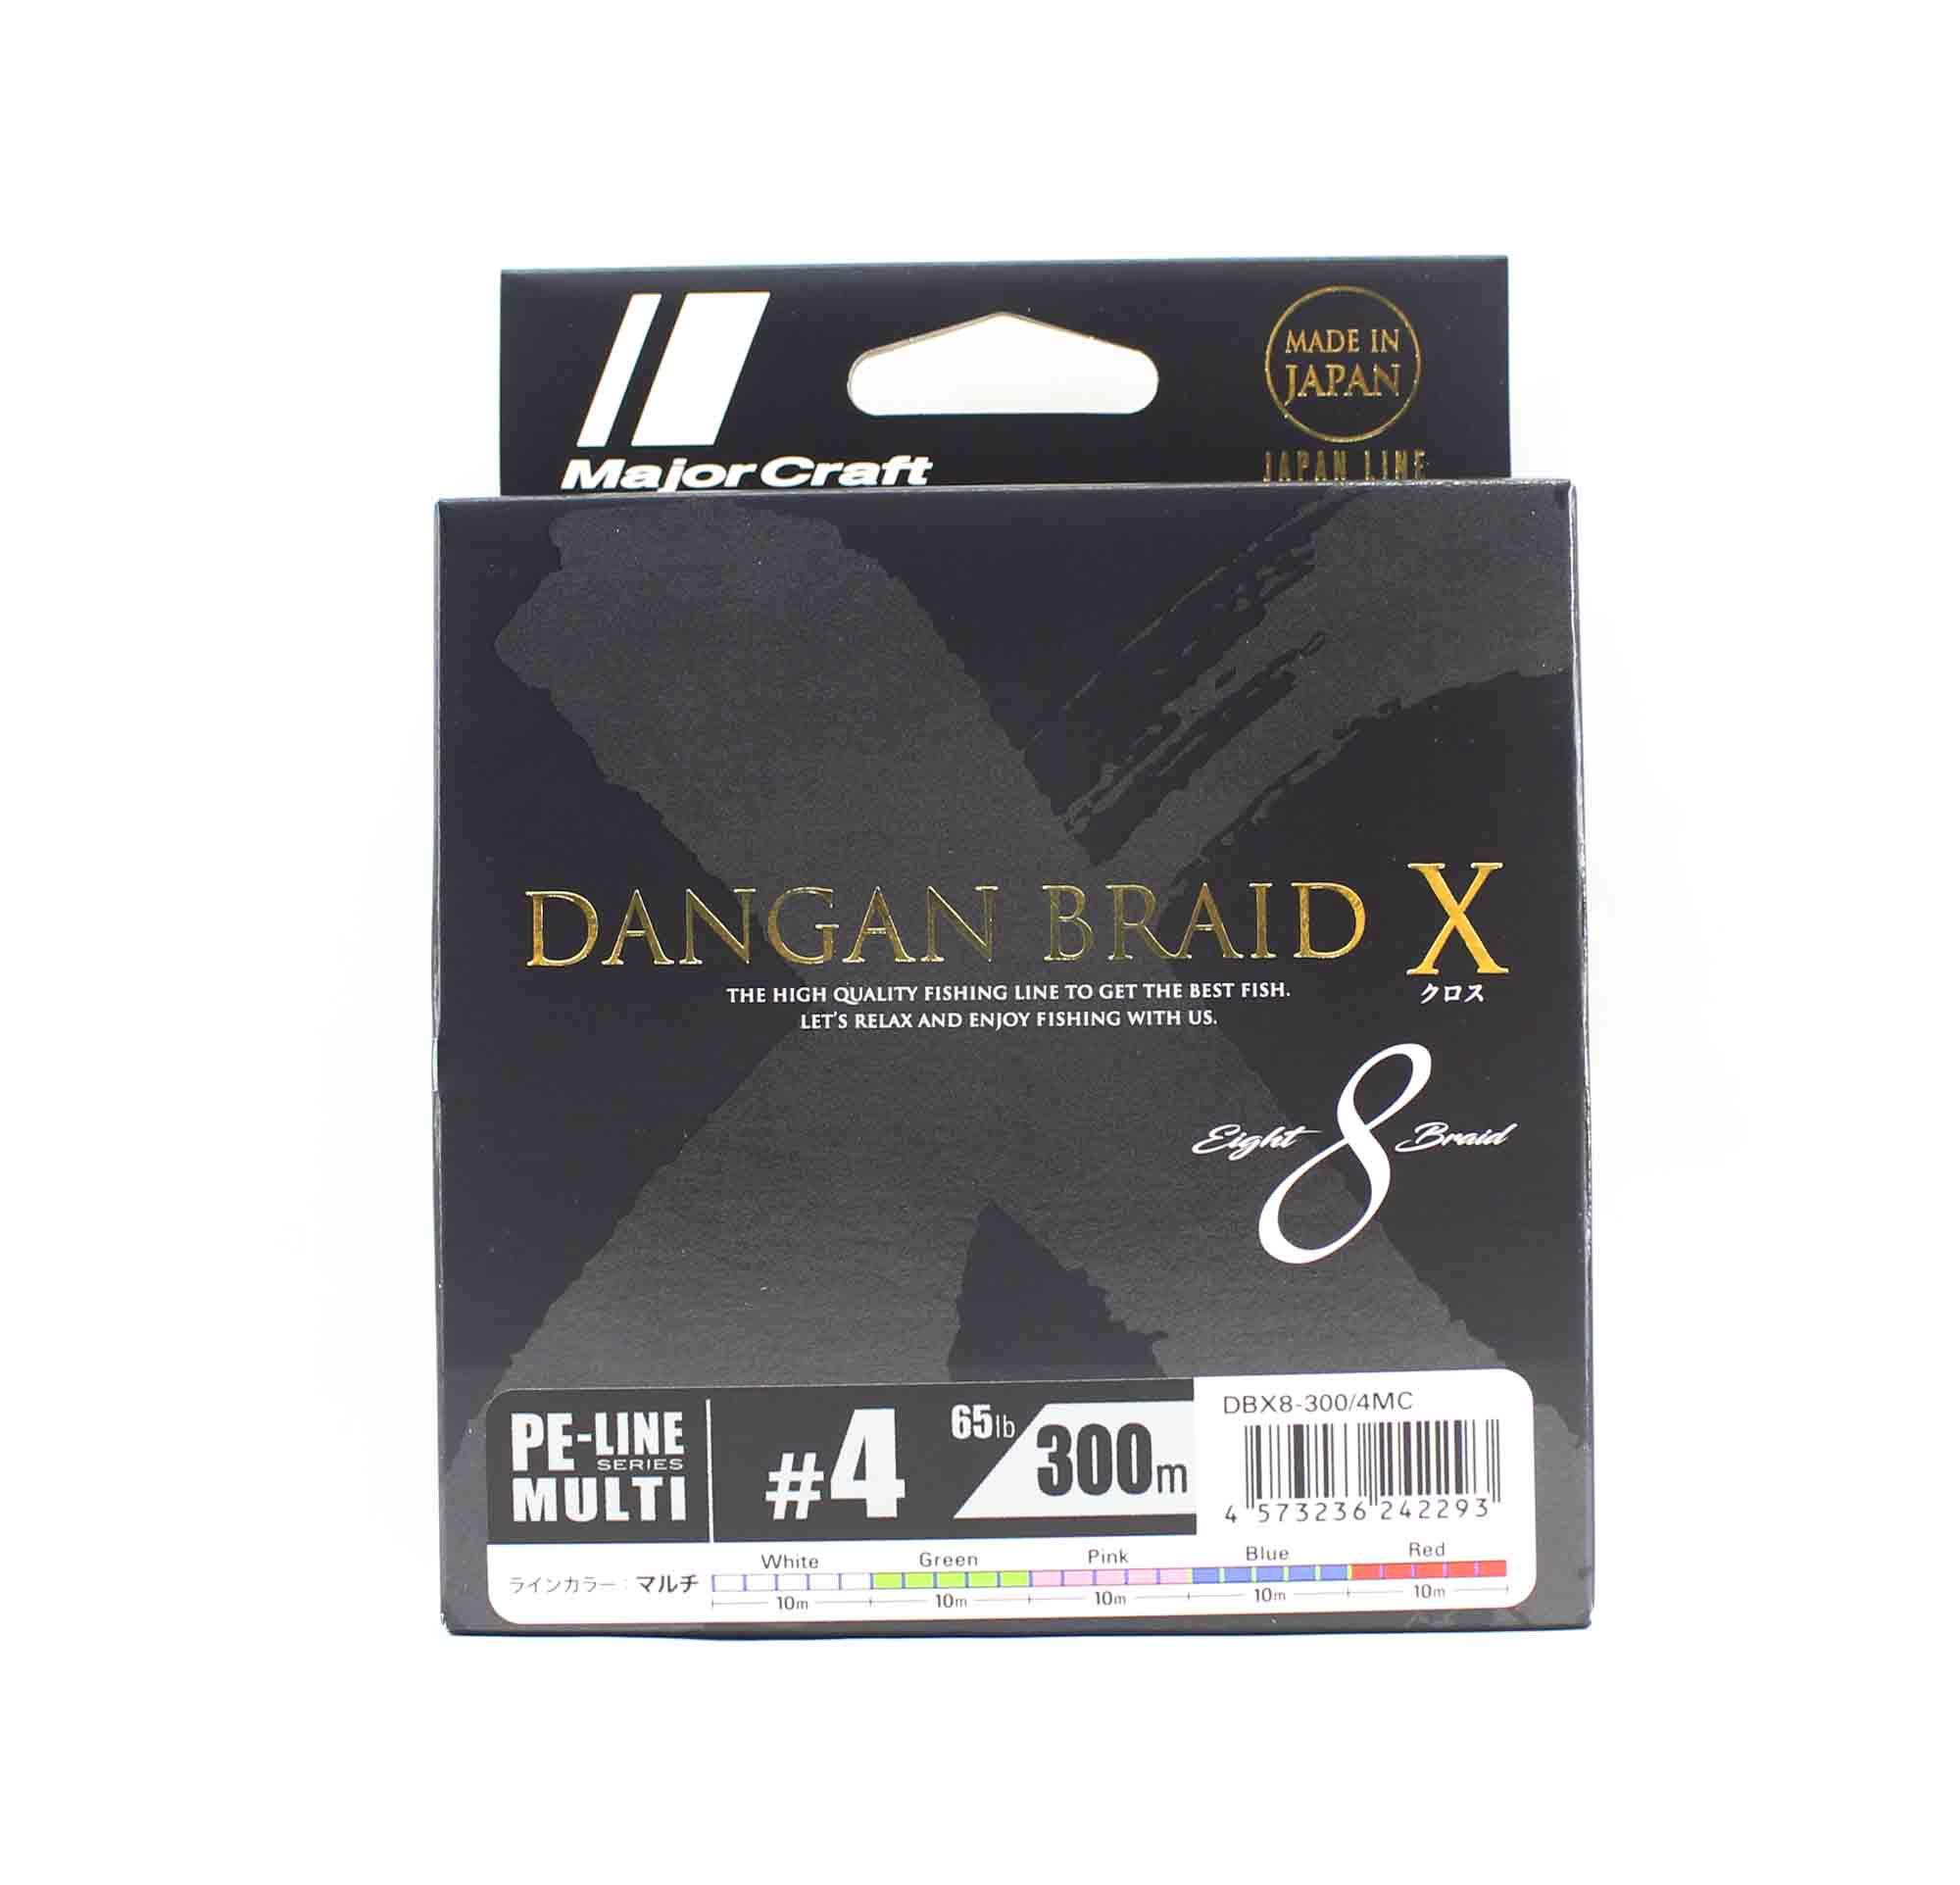 Major Craft Dangan Braid X Line X8 300m P.E 4 Multi DBX8-300/4MC (2293)